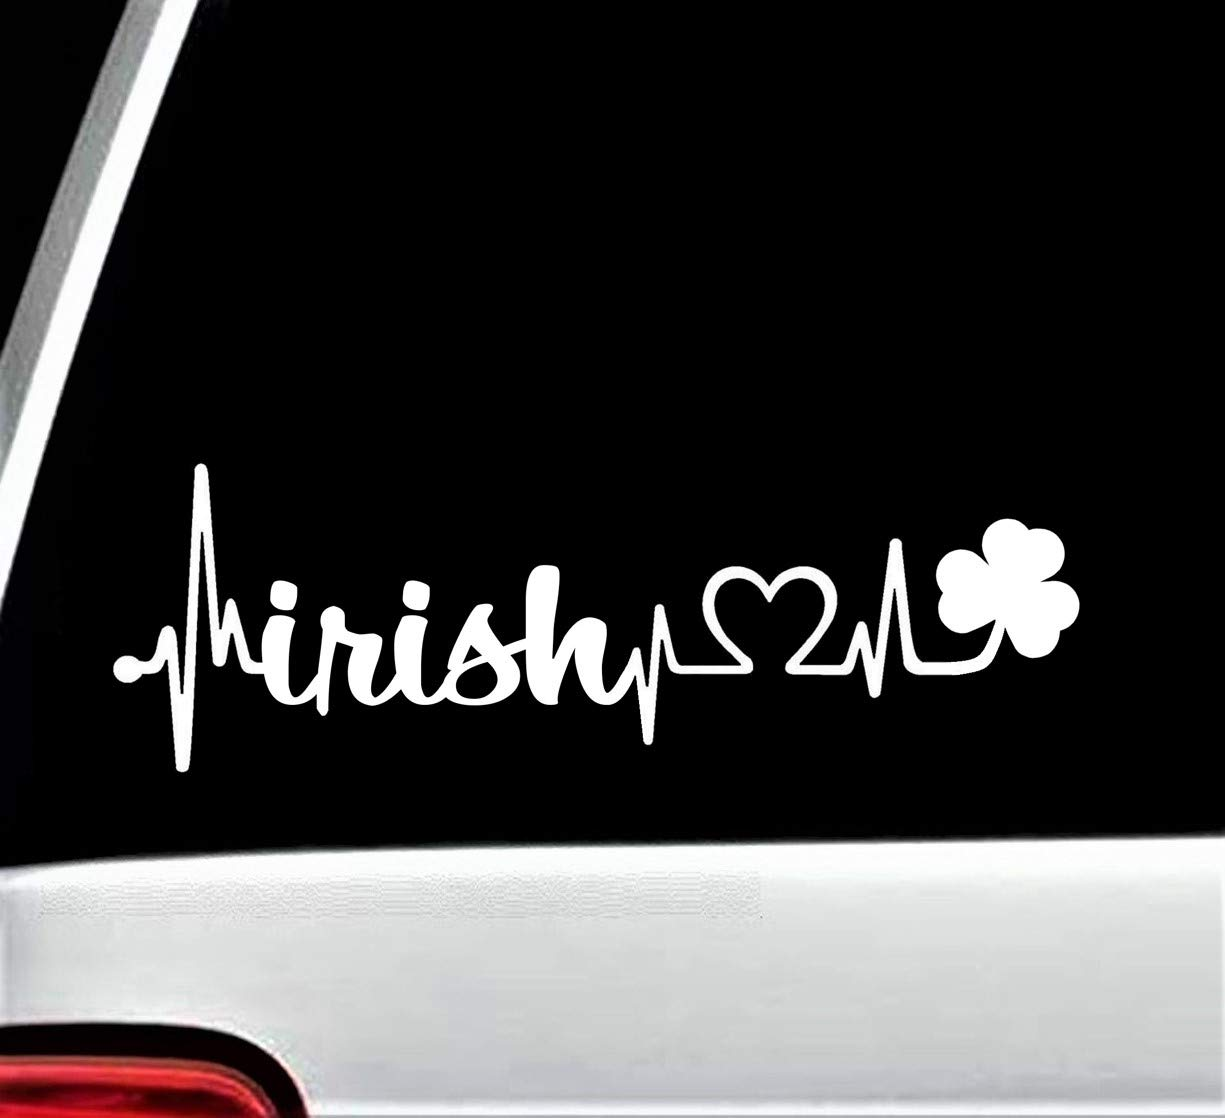 Irish Shamrock Heartbeat Lifeline Decal Sticker for Car Window BG 127